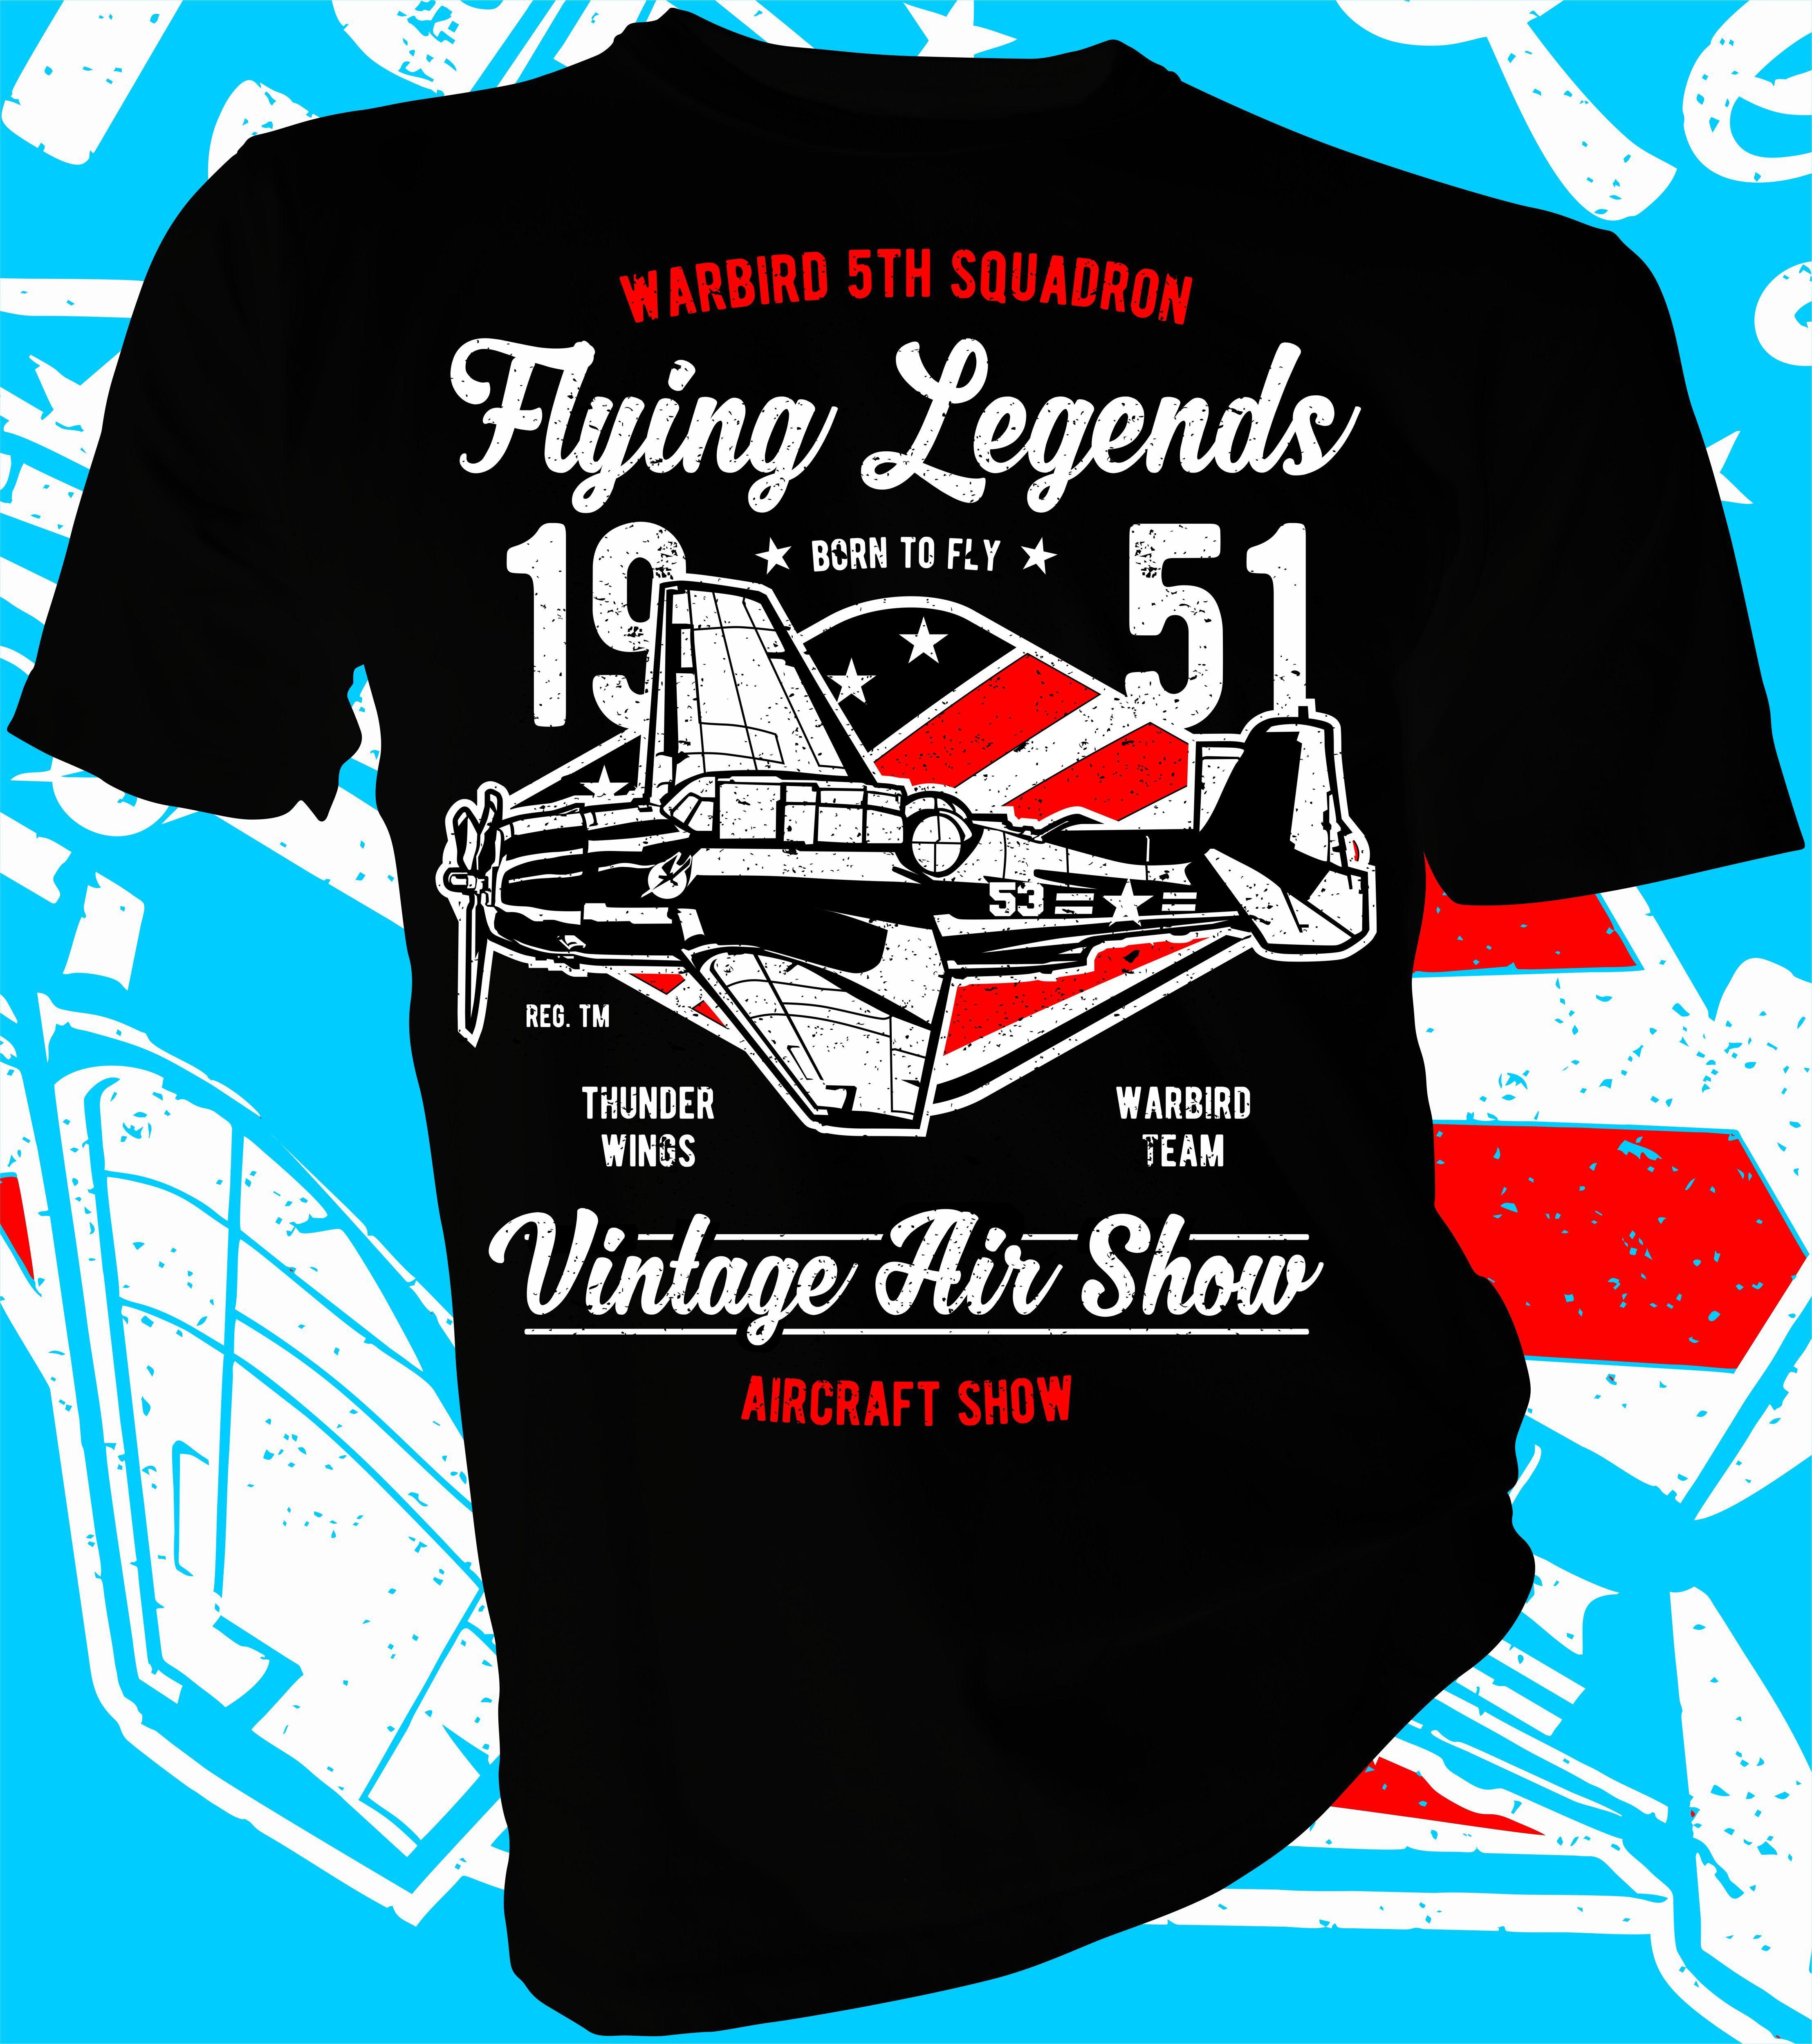 e41340b1 Flying Legends. Pilot designer t-shirt. Sizes from 3-4 Yrs to 5XL. Fruit of  the Loom. #lahfabrics #apparel #clothes #fashion #tee #tees #teeshirt # tshirt ...